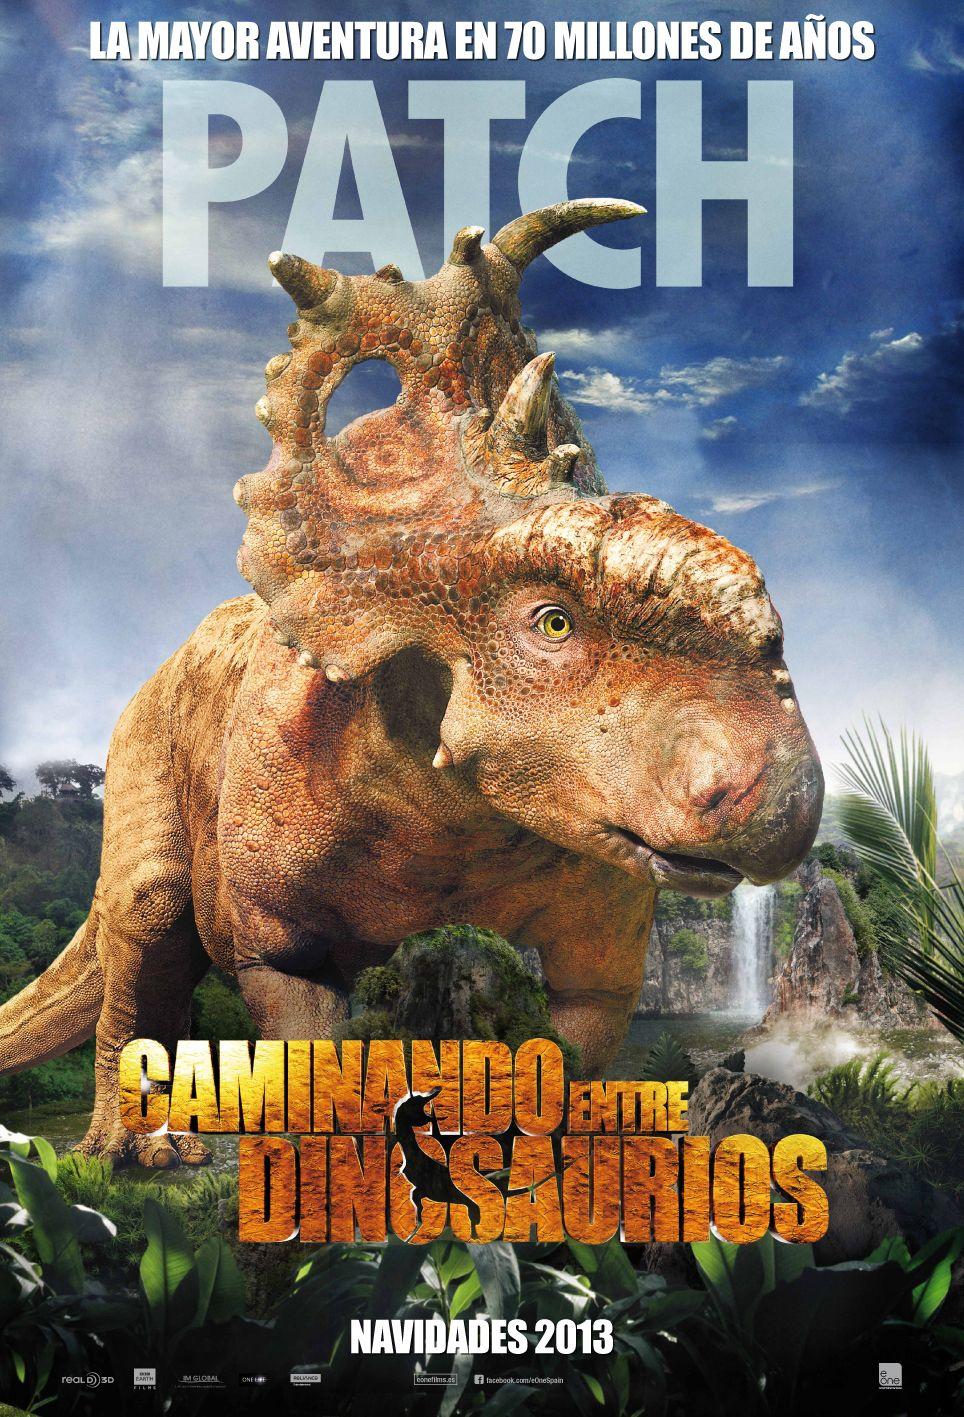 Pin By Nuestros Comics On Carteles Caminando Entre Dinosaurios Walking With Dinosaurs Movie Posters Dinosaur